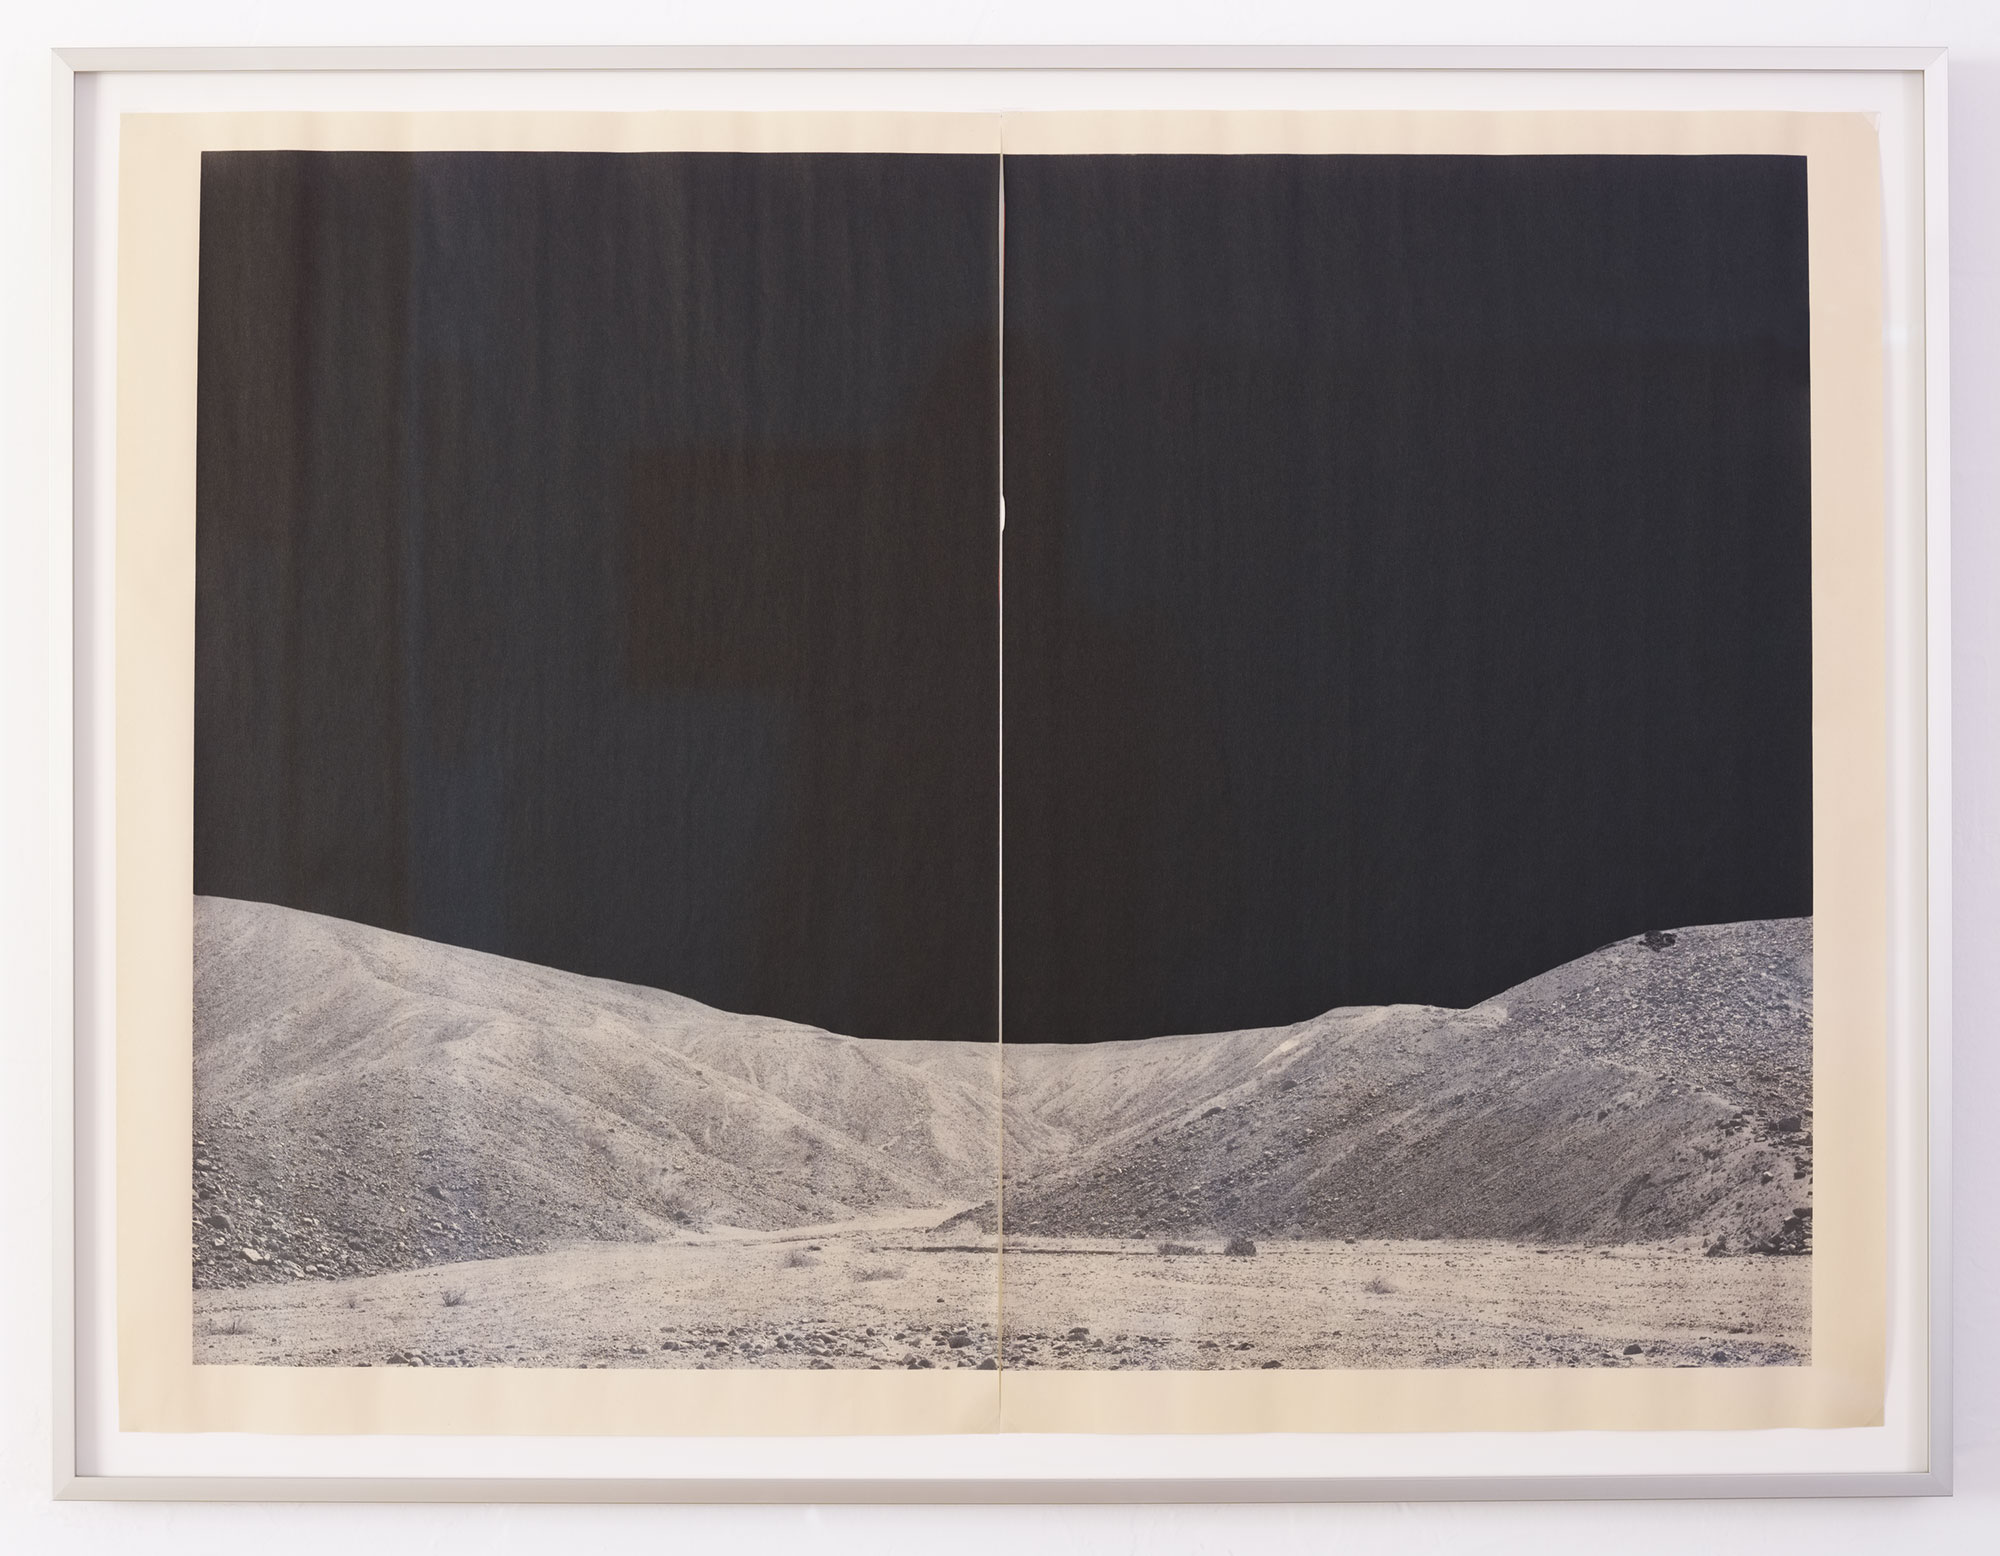 DV_7315, u nique diptych pigment print on newsprint,aluminum artist frame,26.25 x 35.25 inches